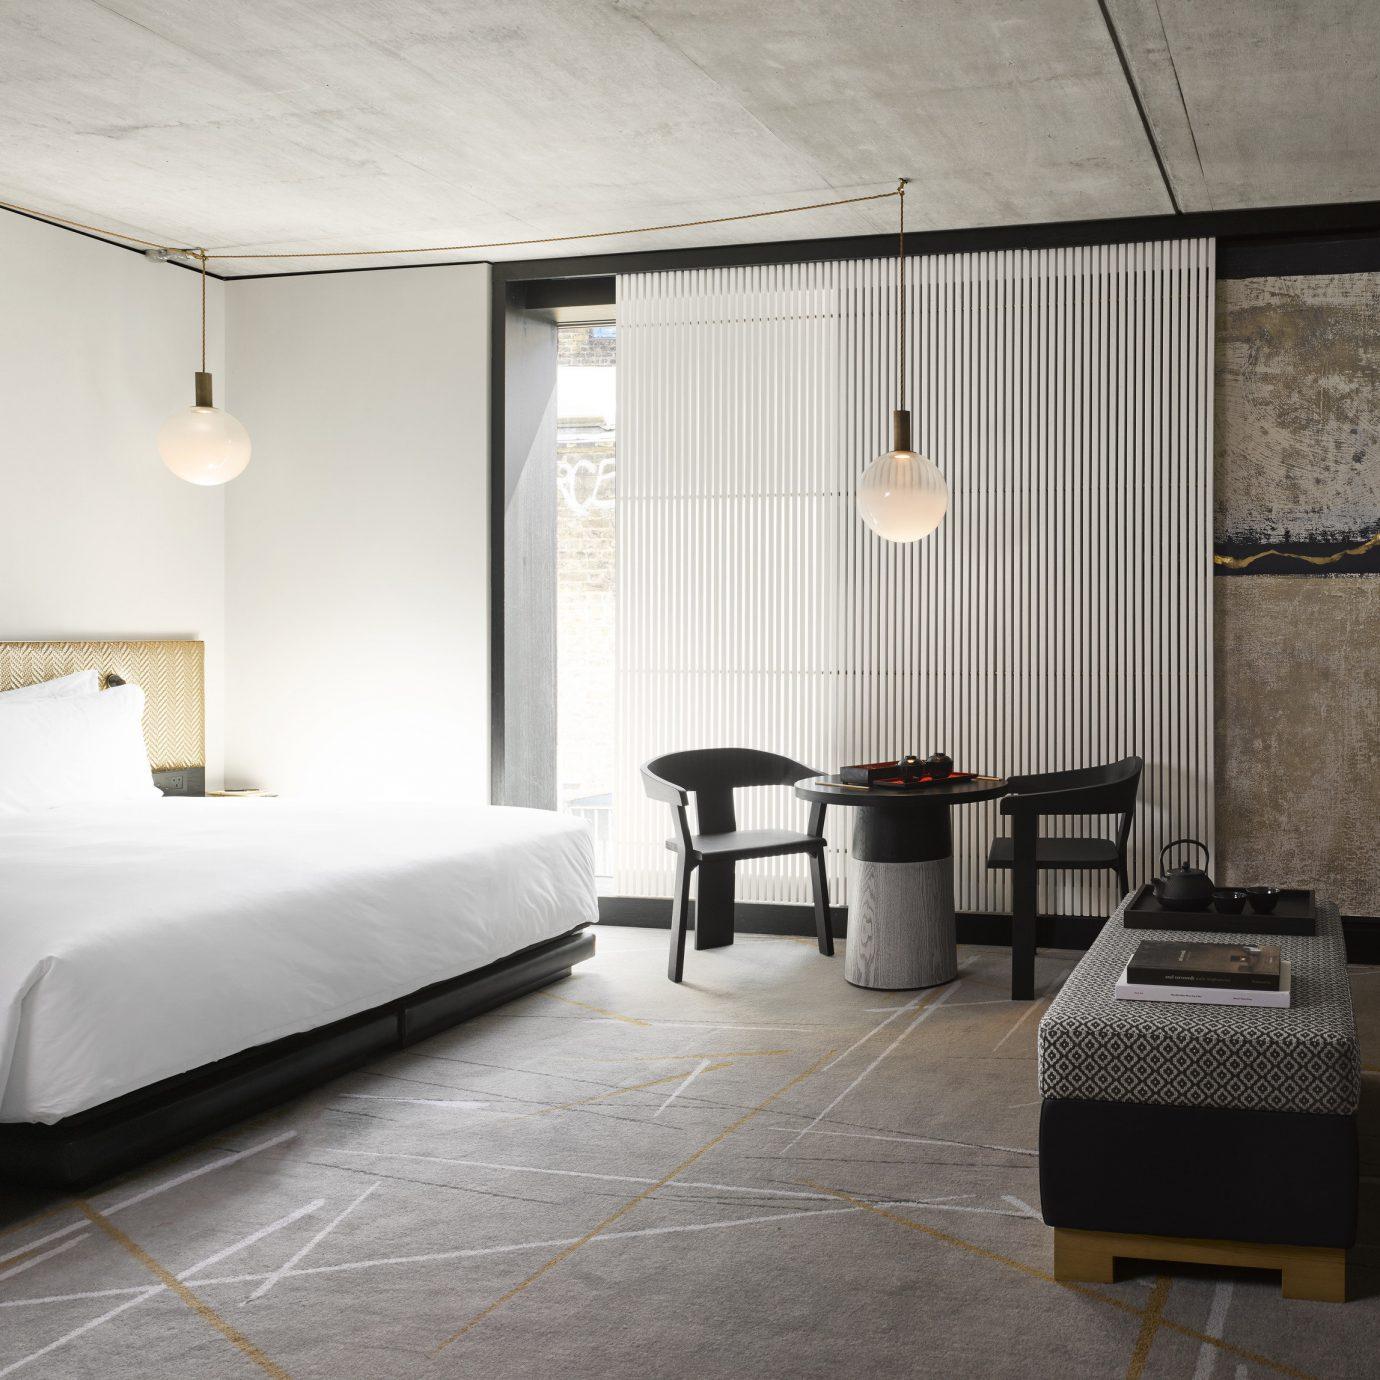 Architecture Suite bed frame flooring Bedroom interior designer